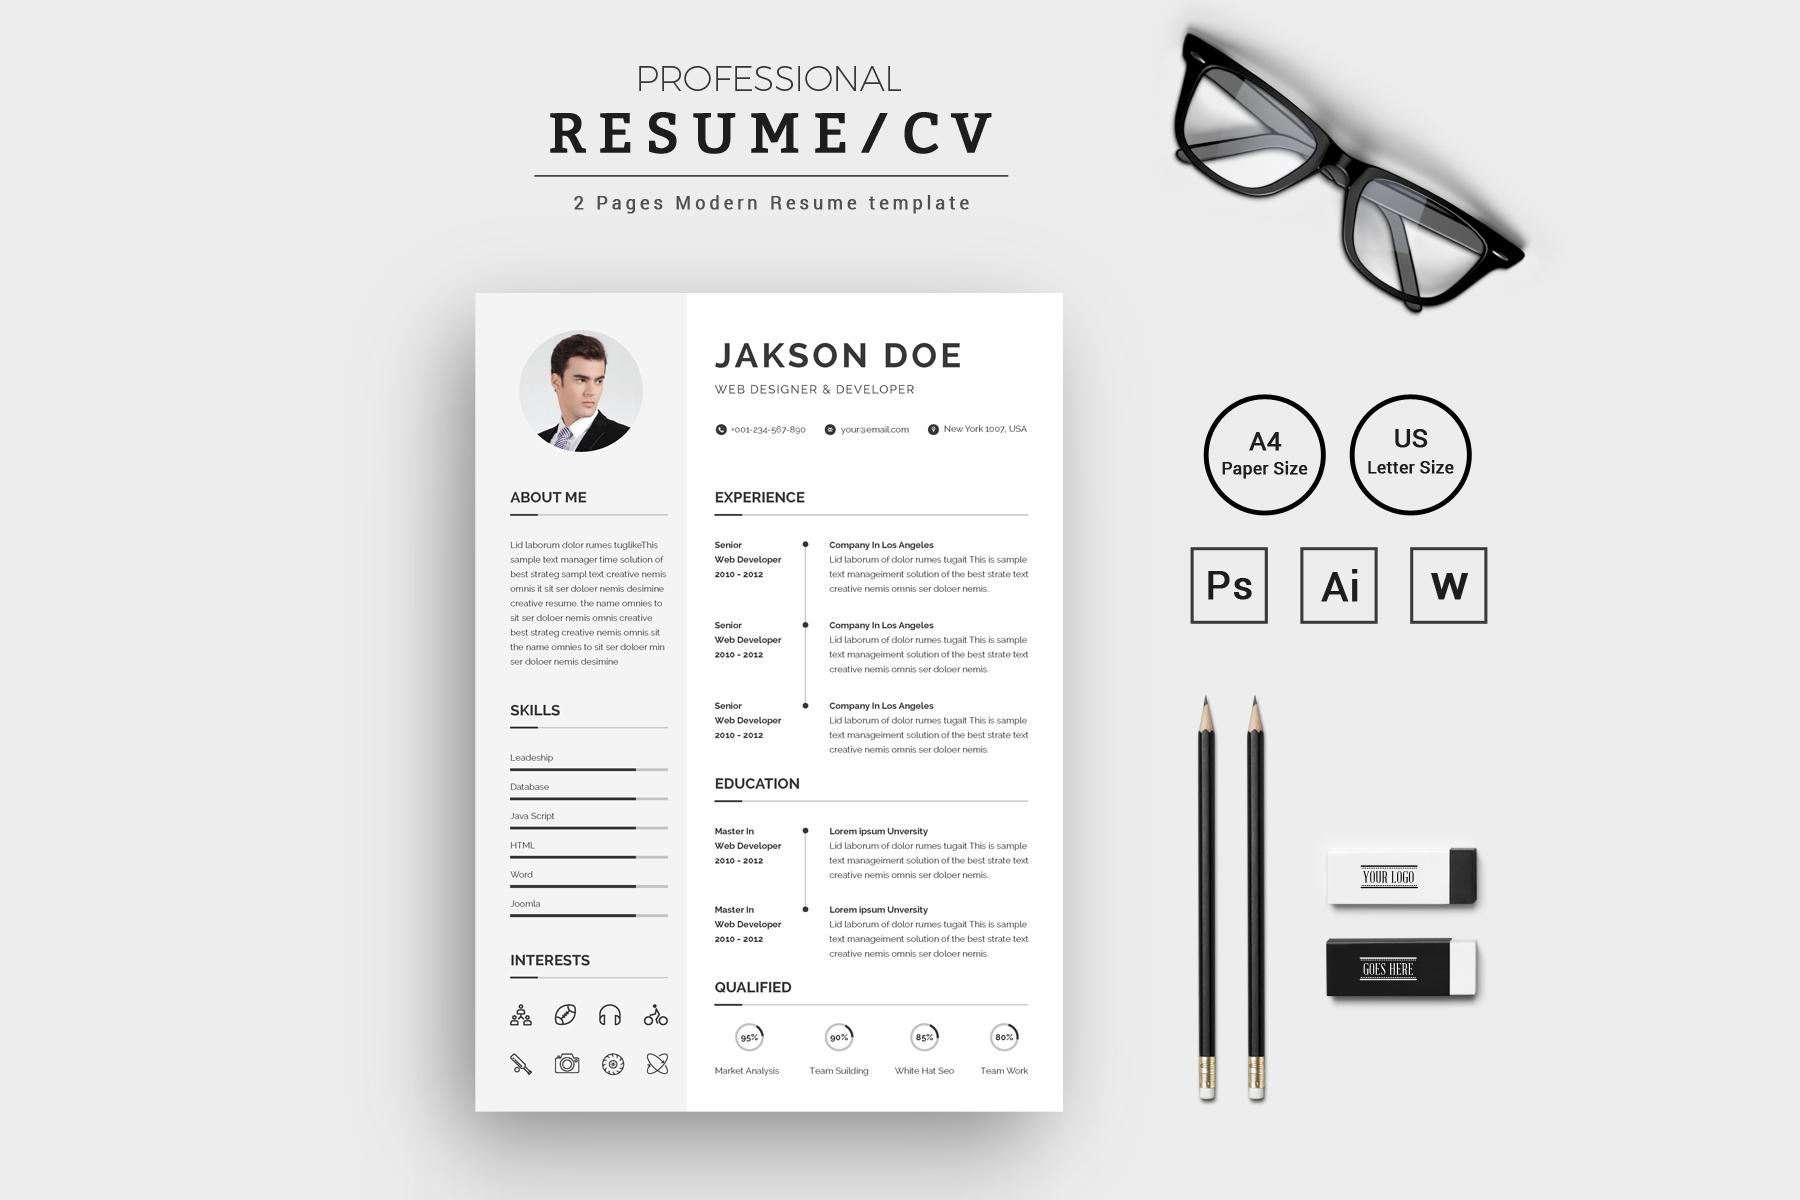 Jakson Doe Web Designer & Developer CV/ Resume Template #71811